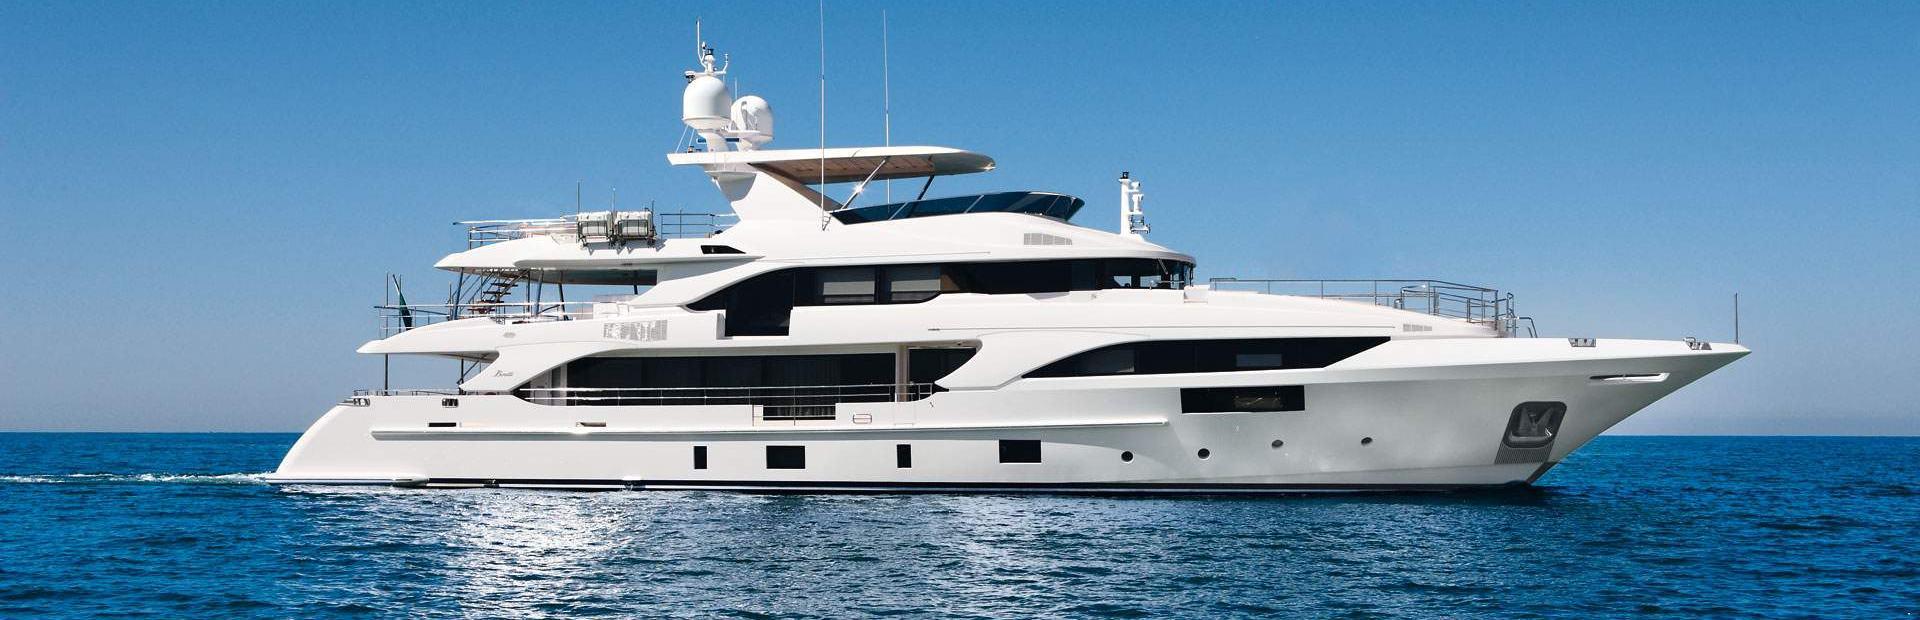 Classic Supreme 132' Yacht Charter